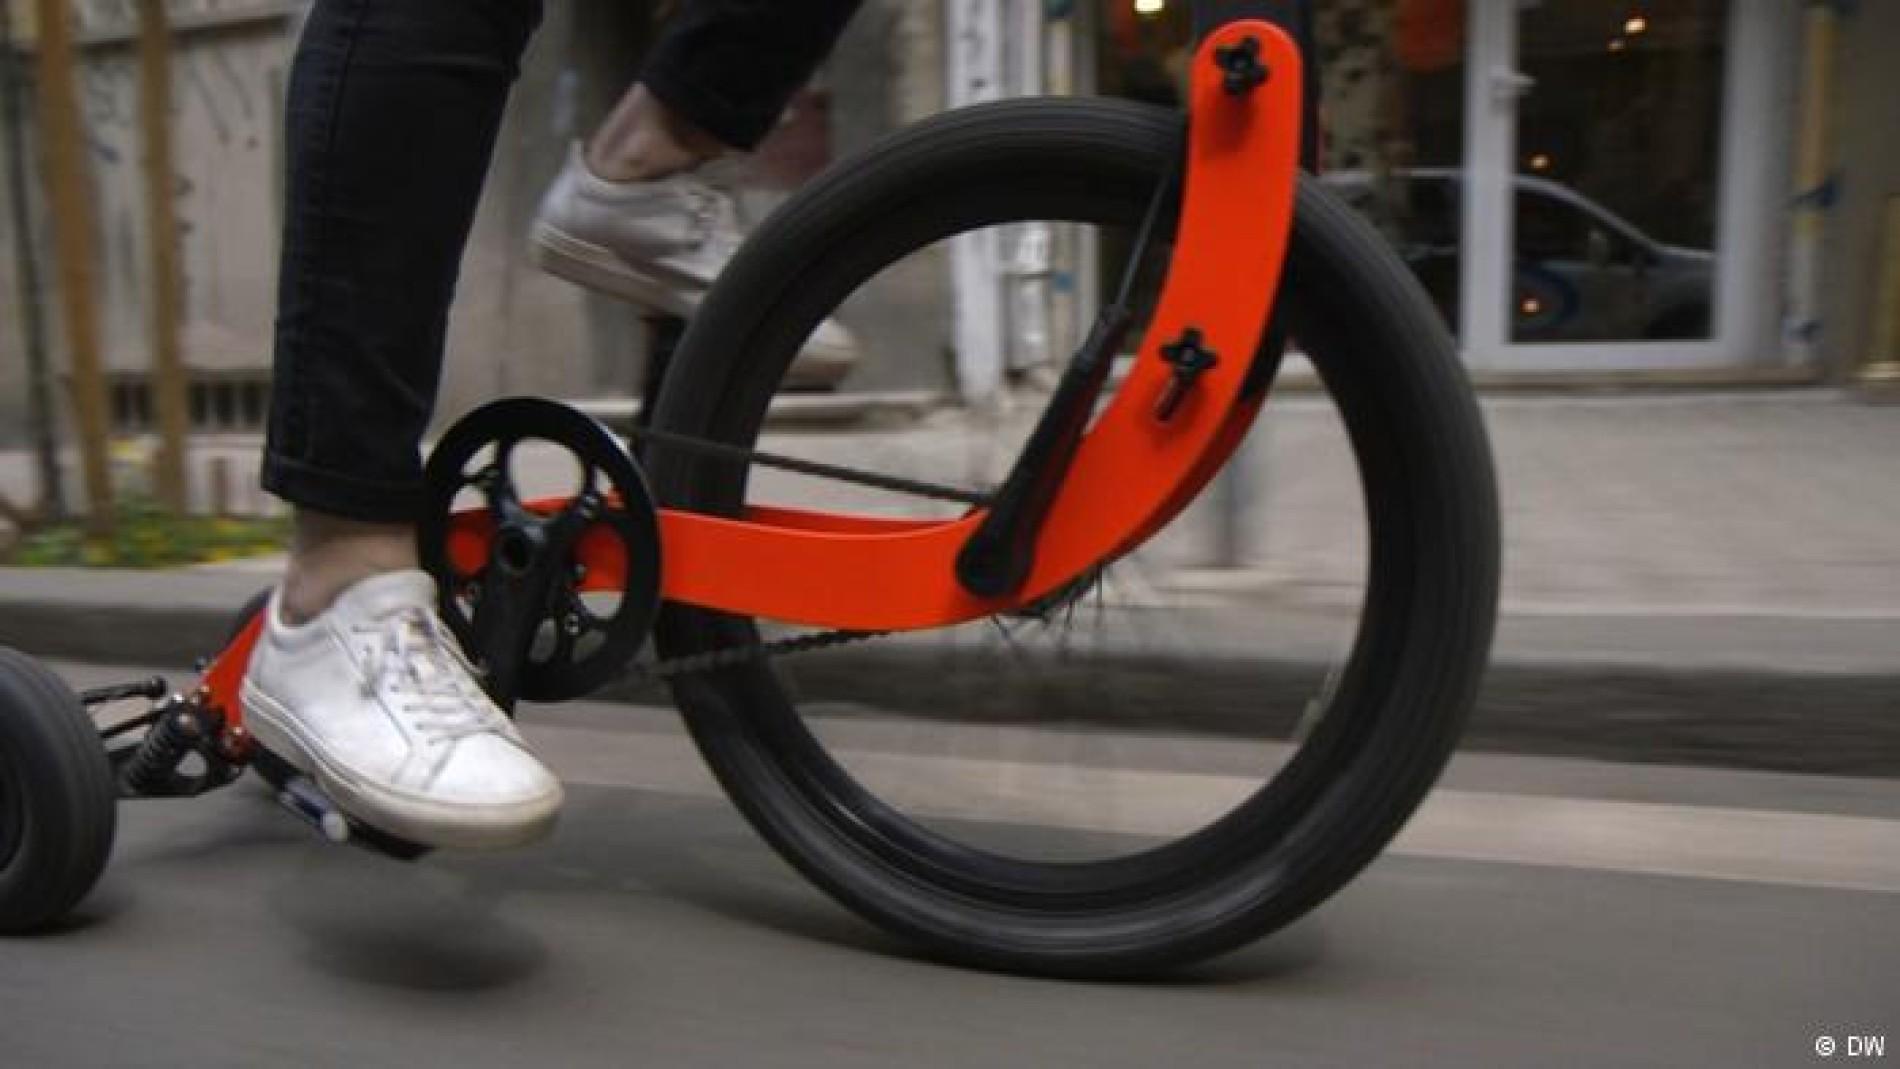 2016 BOSCH e-bike Motor Active Line Bj Elektrofahrradteile